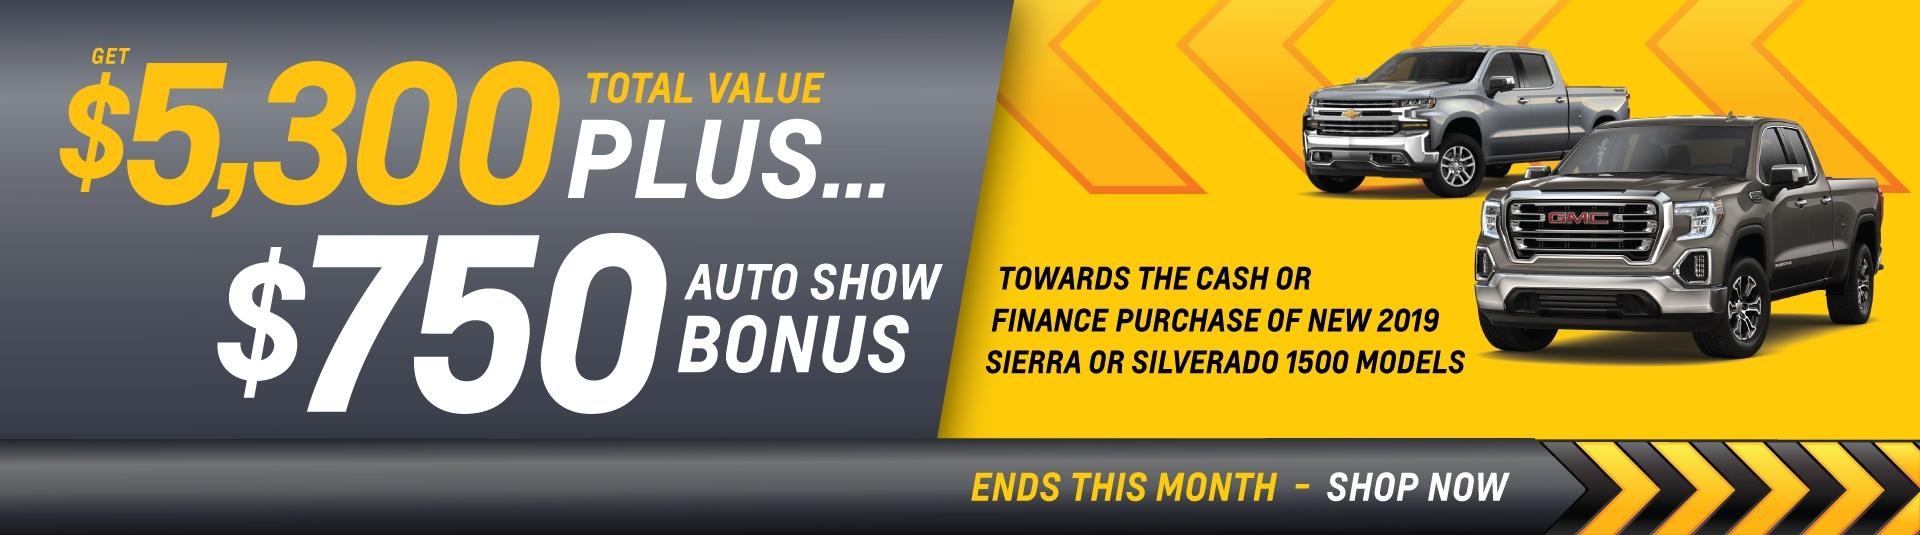 GM auto show bonus